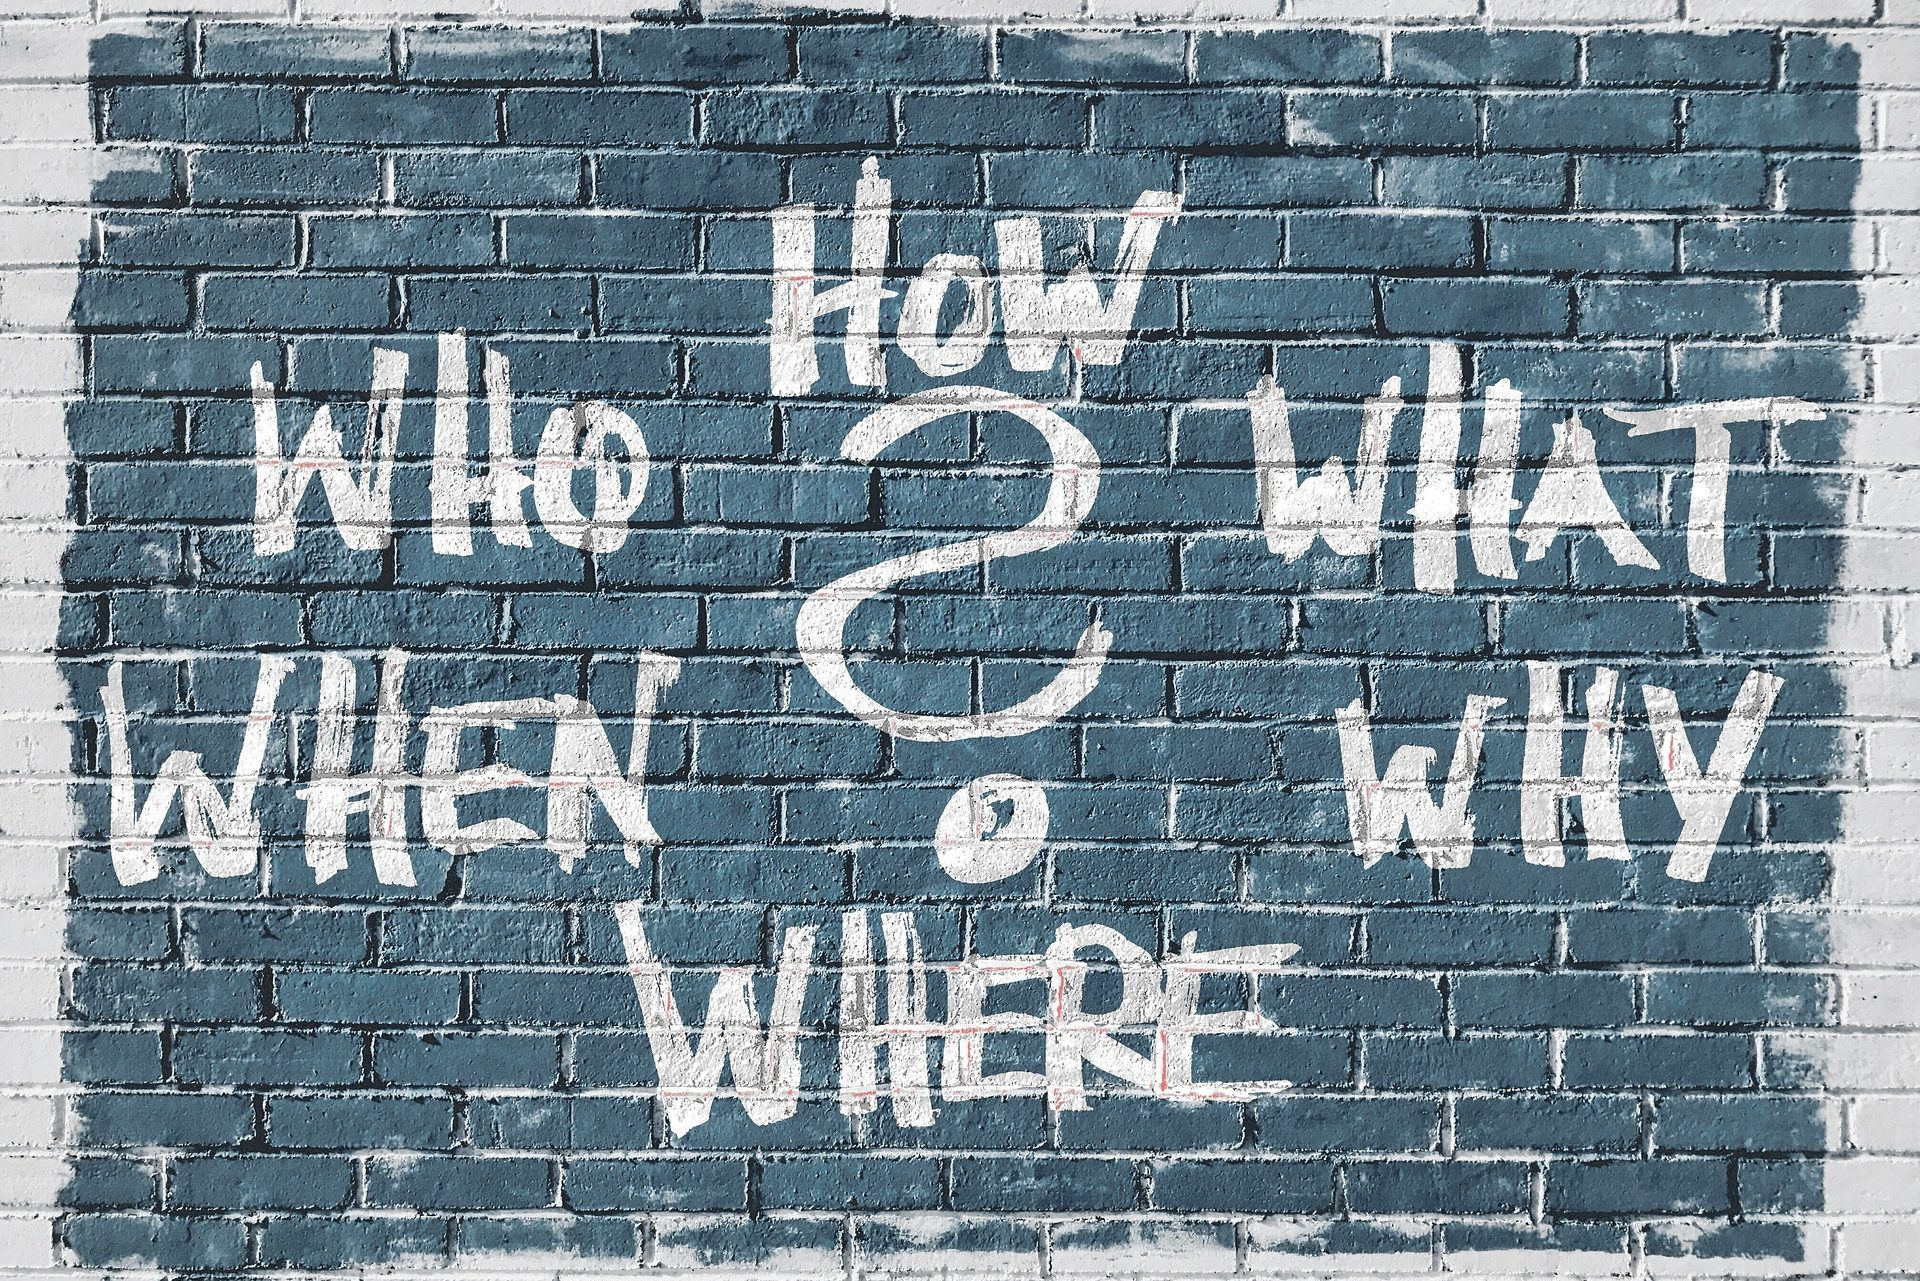 questions-2110967_1920-e1534212616647.jpg